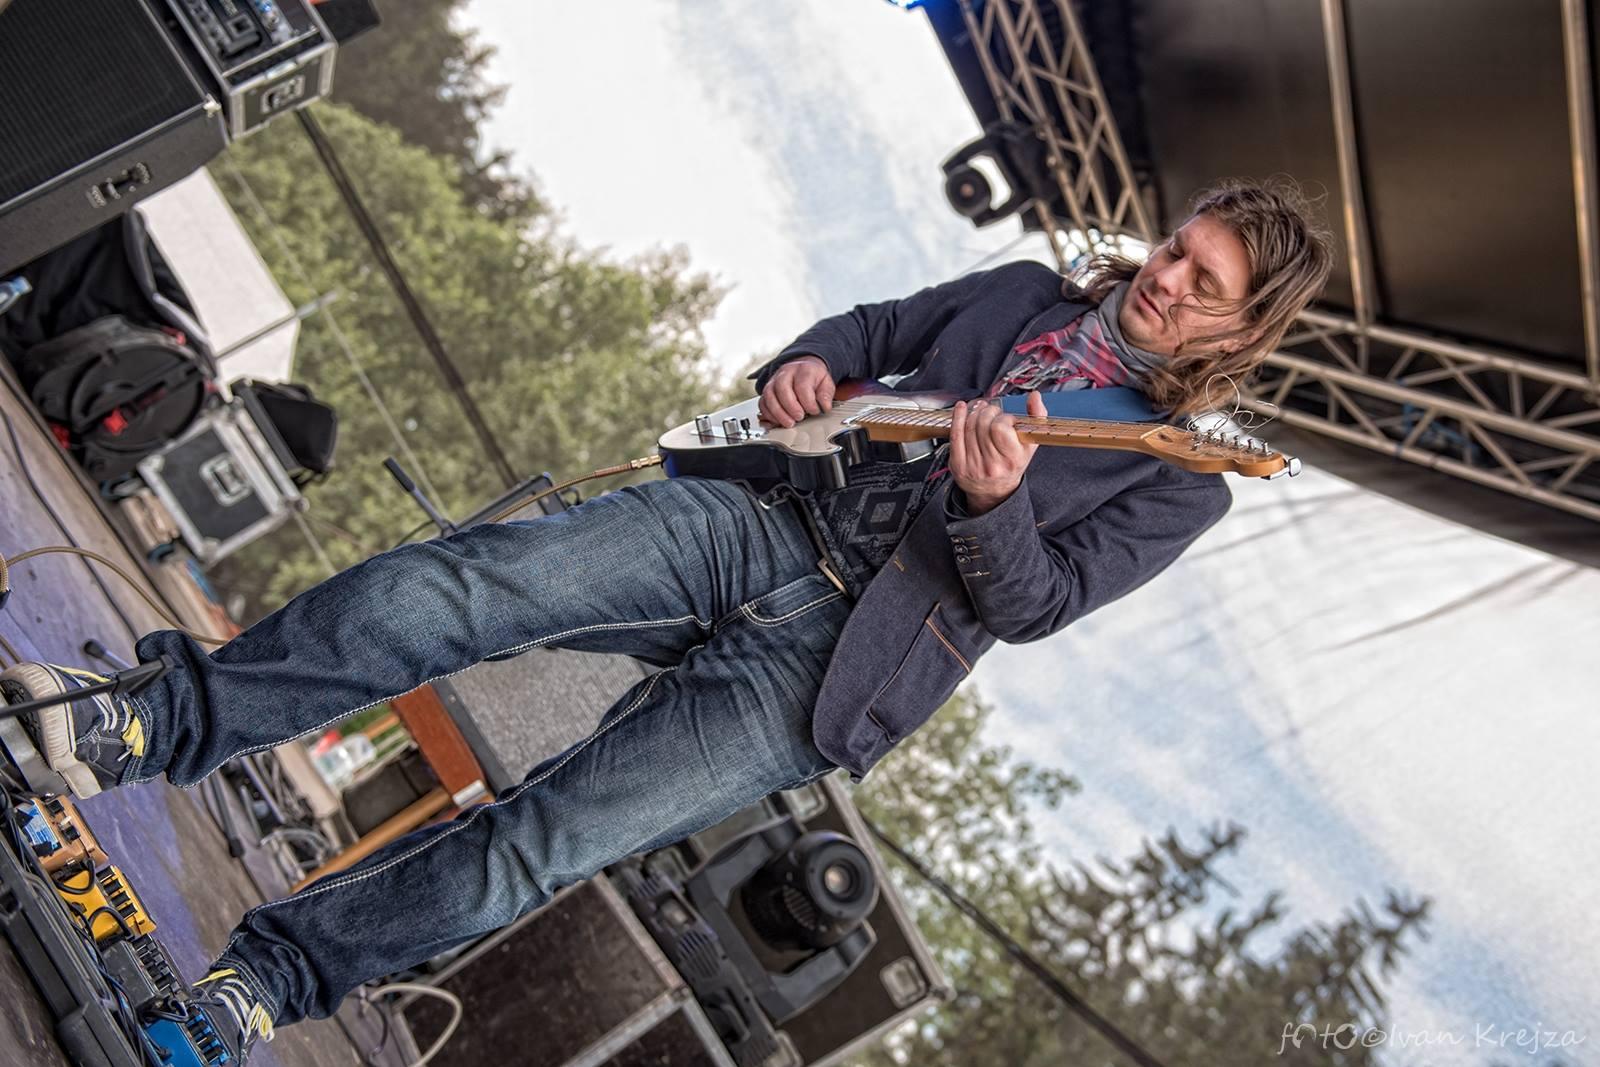 2015-06-20 - Hrebecsky Slunovrat 2015 - 20 (Gang Ala Basta) - Milan Broum jr.